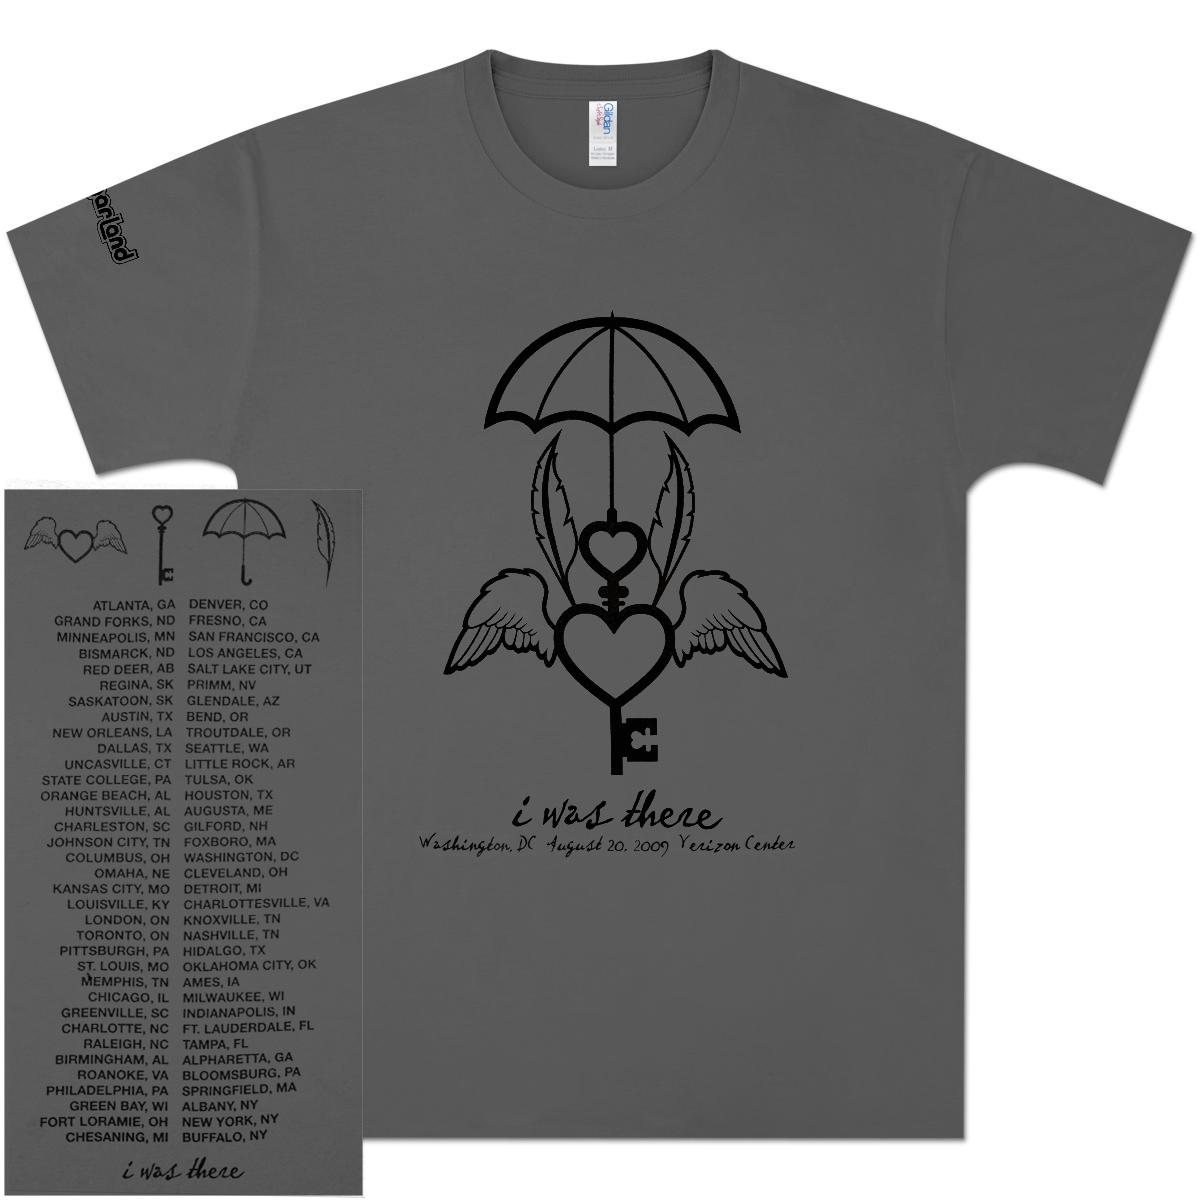 Sugarland Washington, DC Event T-Shirt